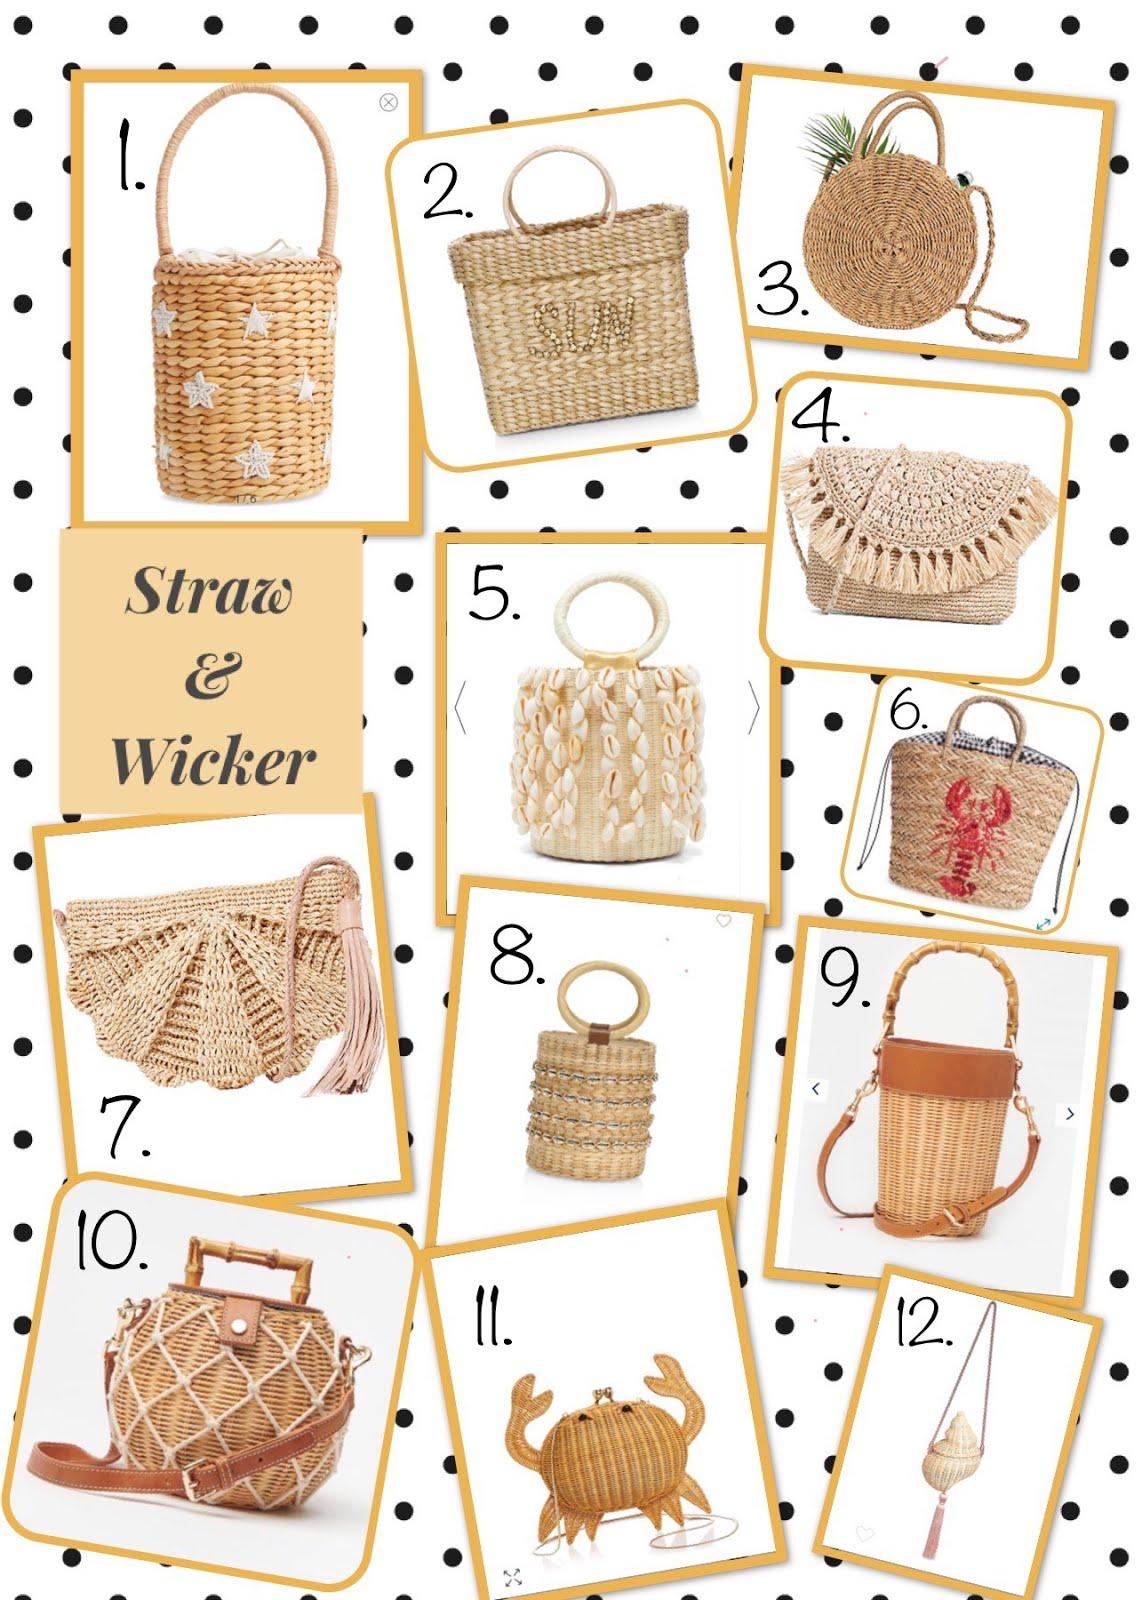 Straw & Wicker Bags: Spring 2020